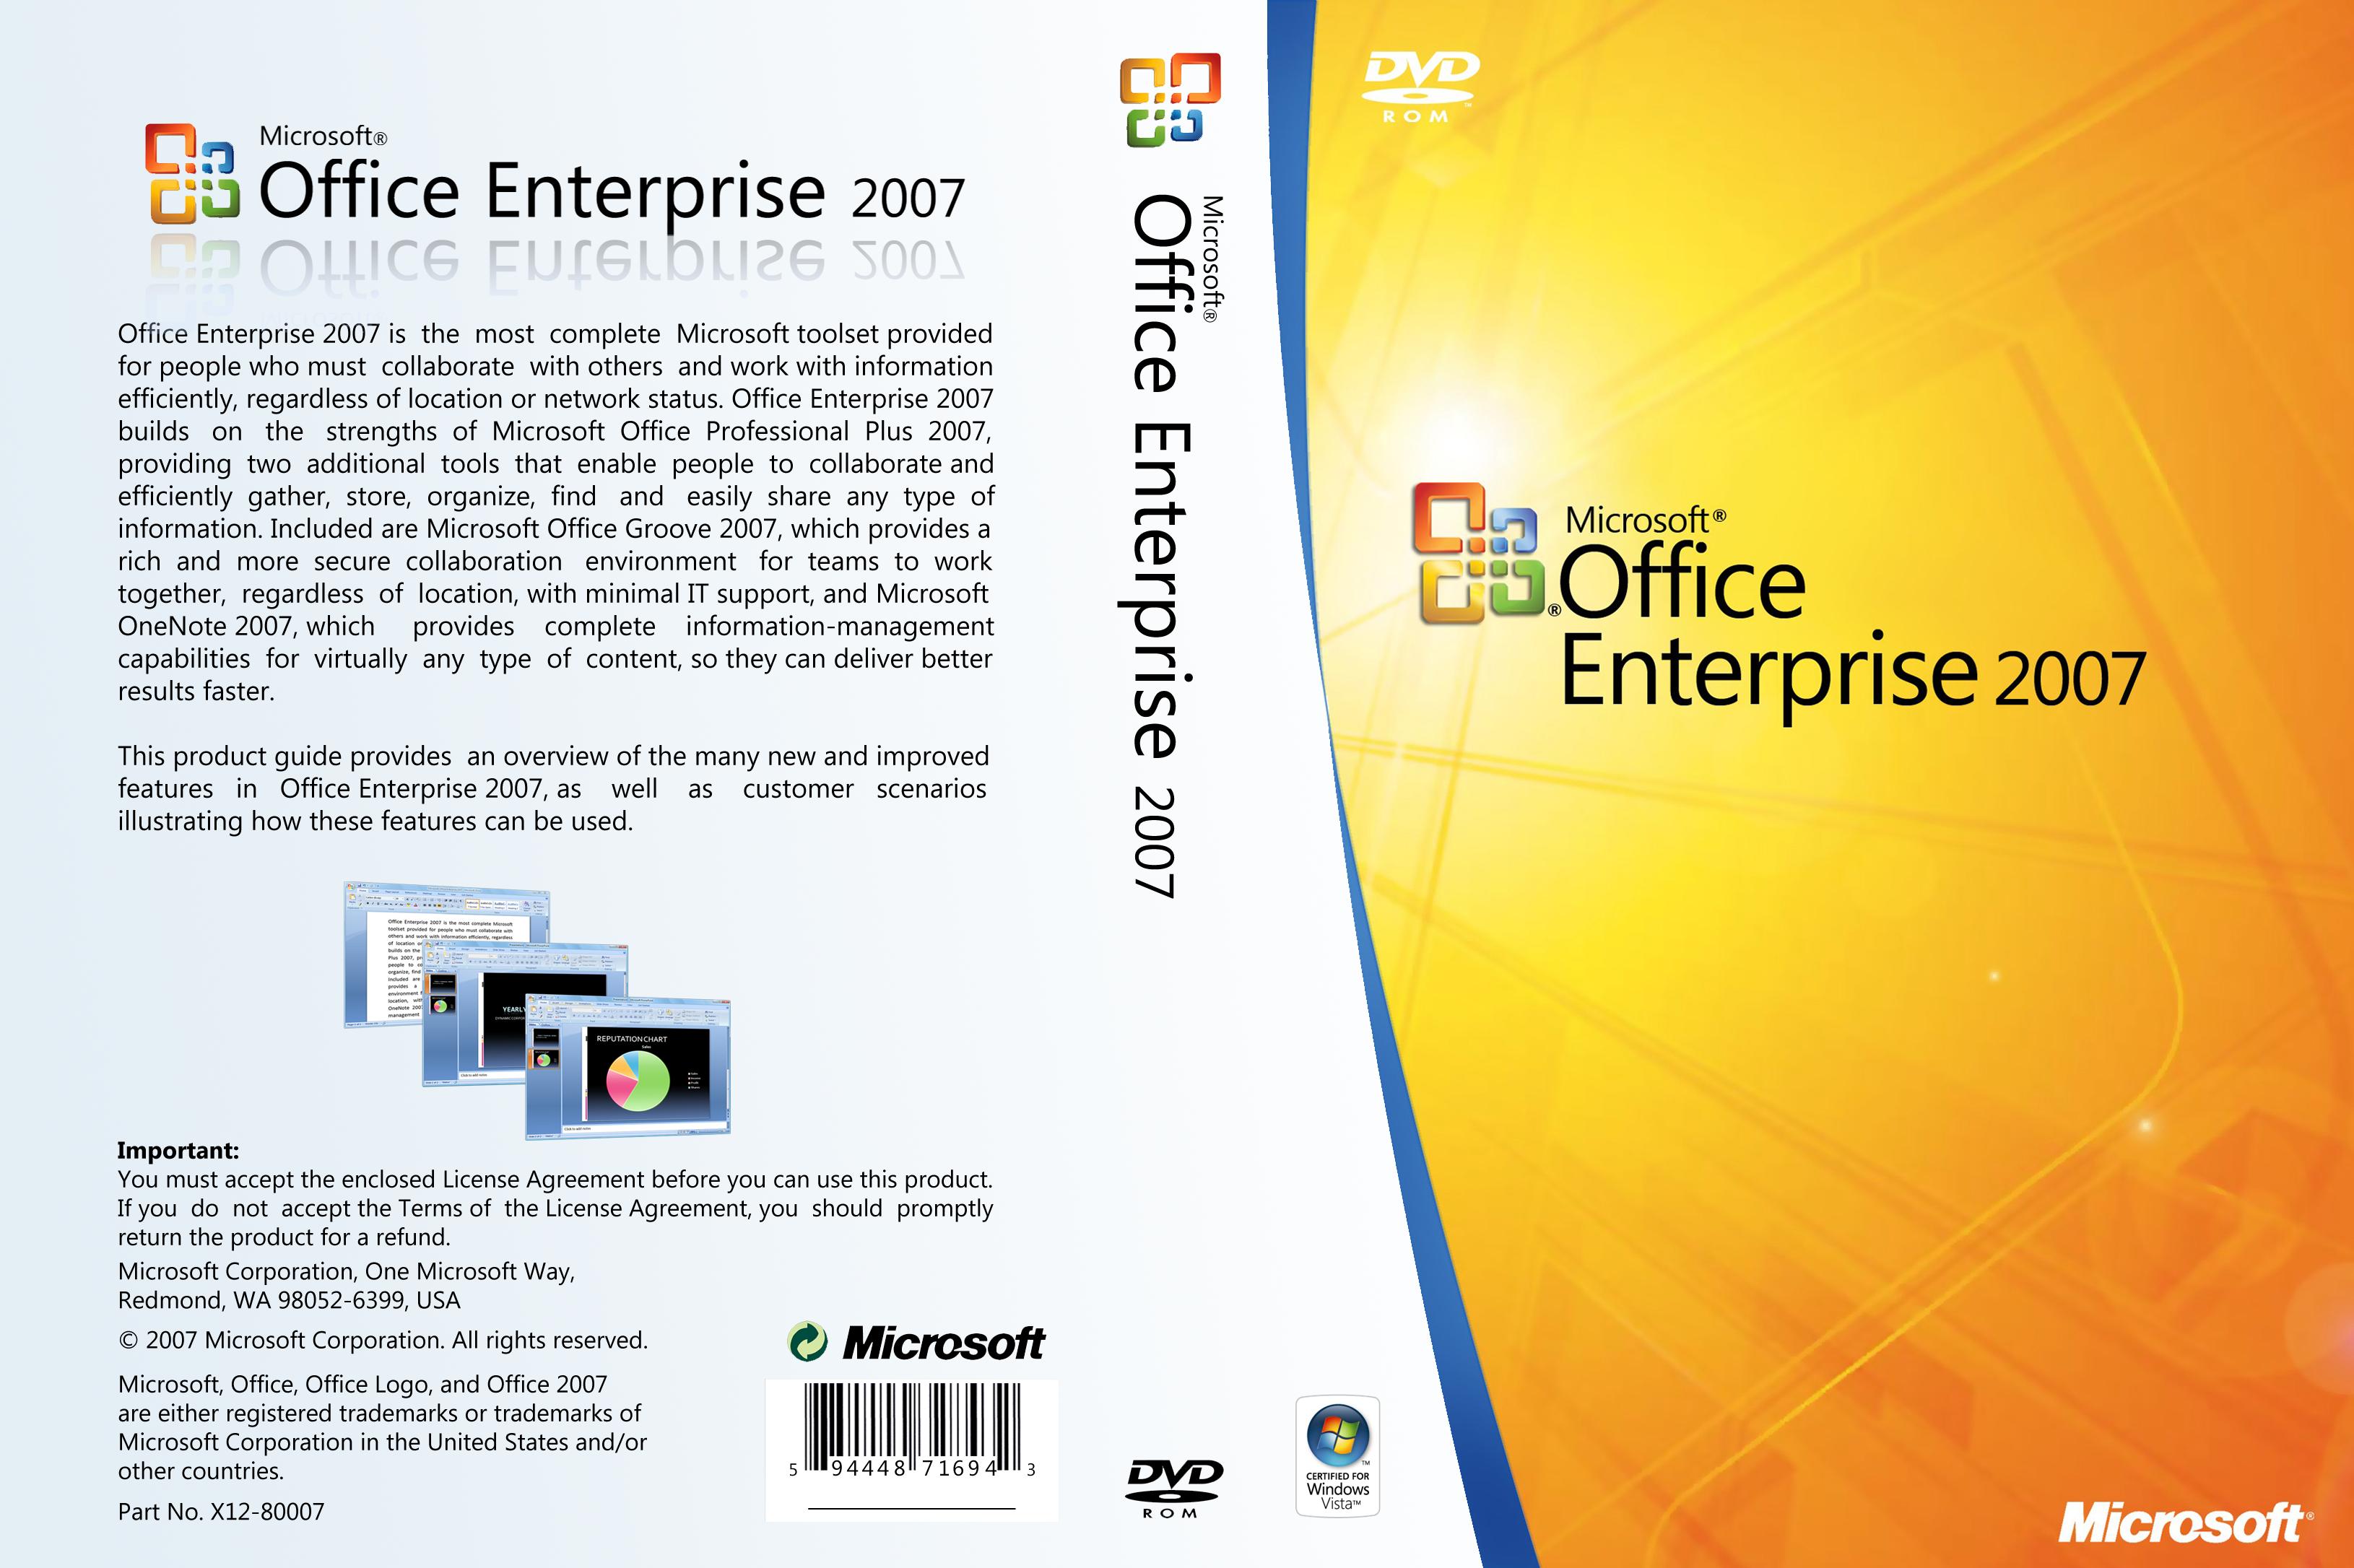 Office Enterprise 2007 Cover by zawir